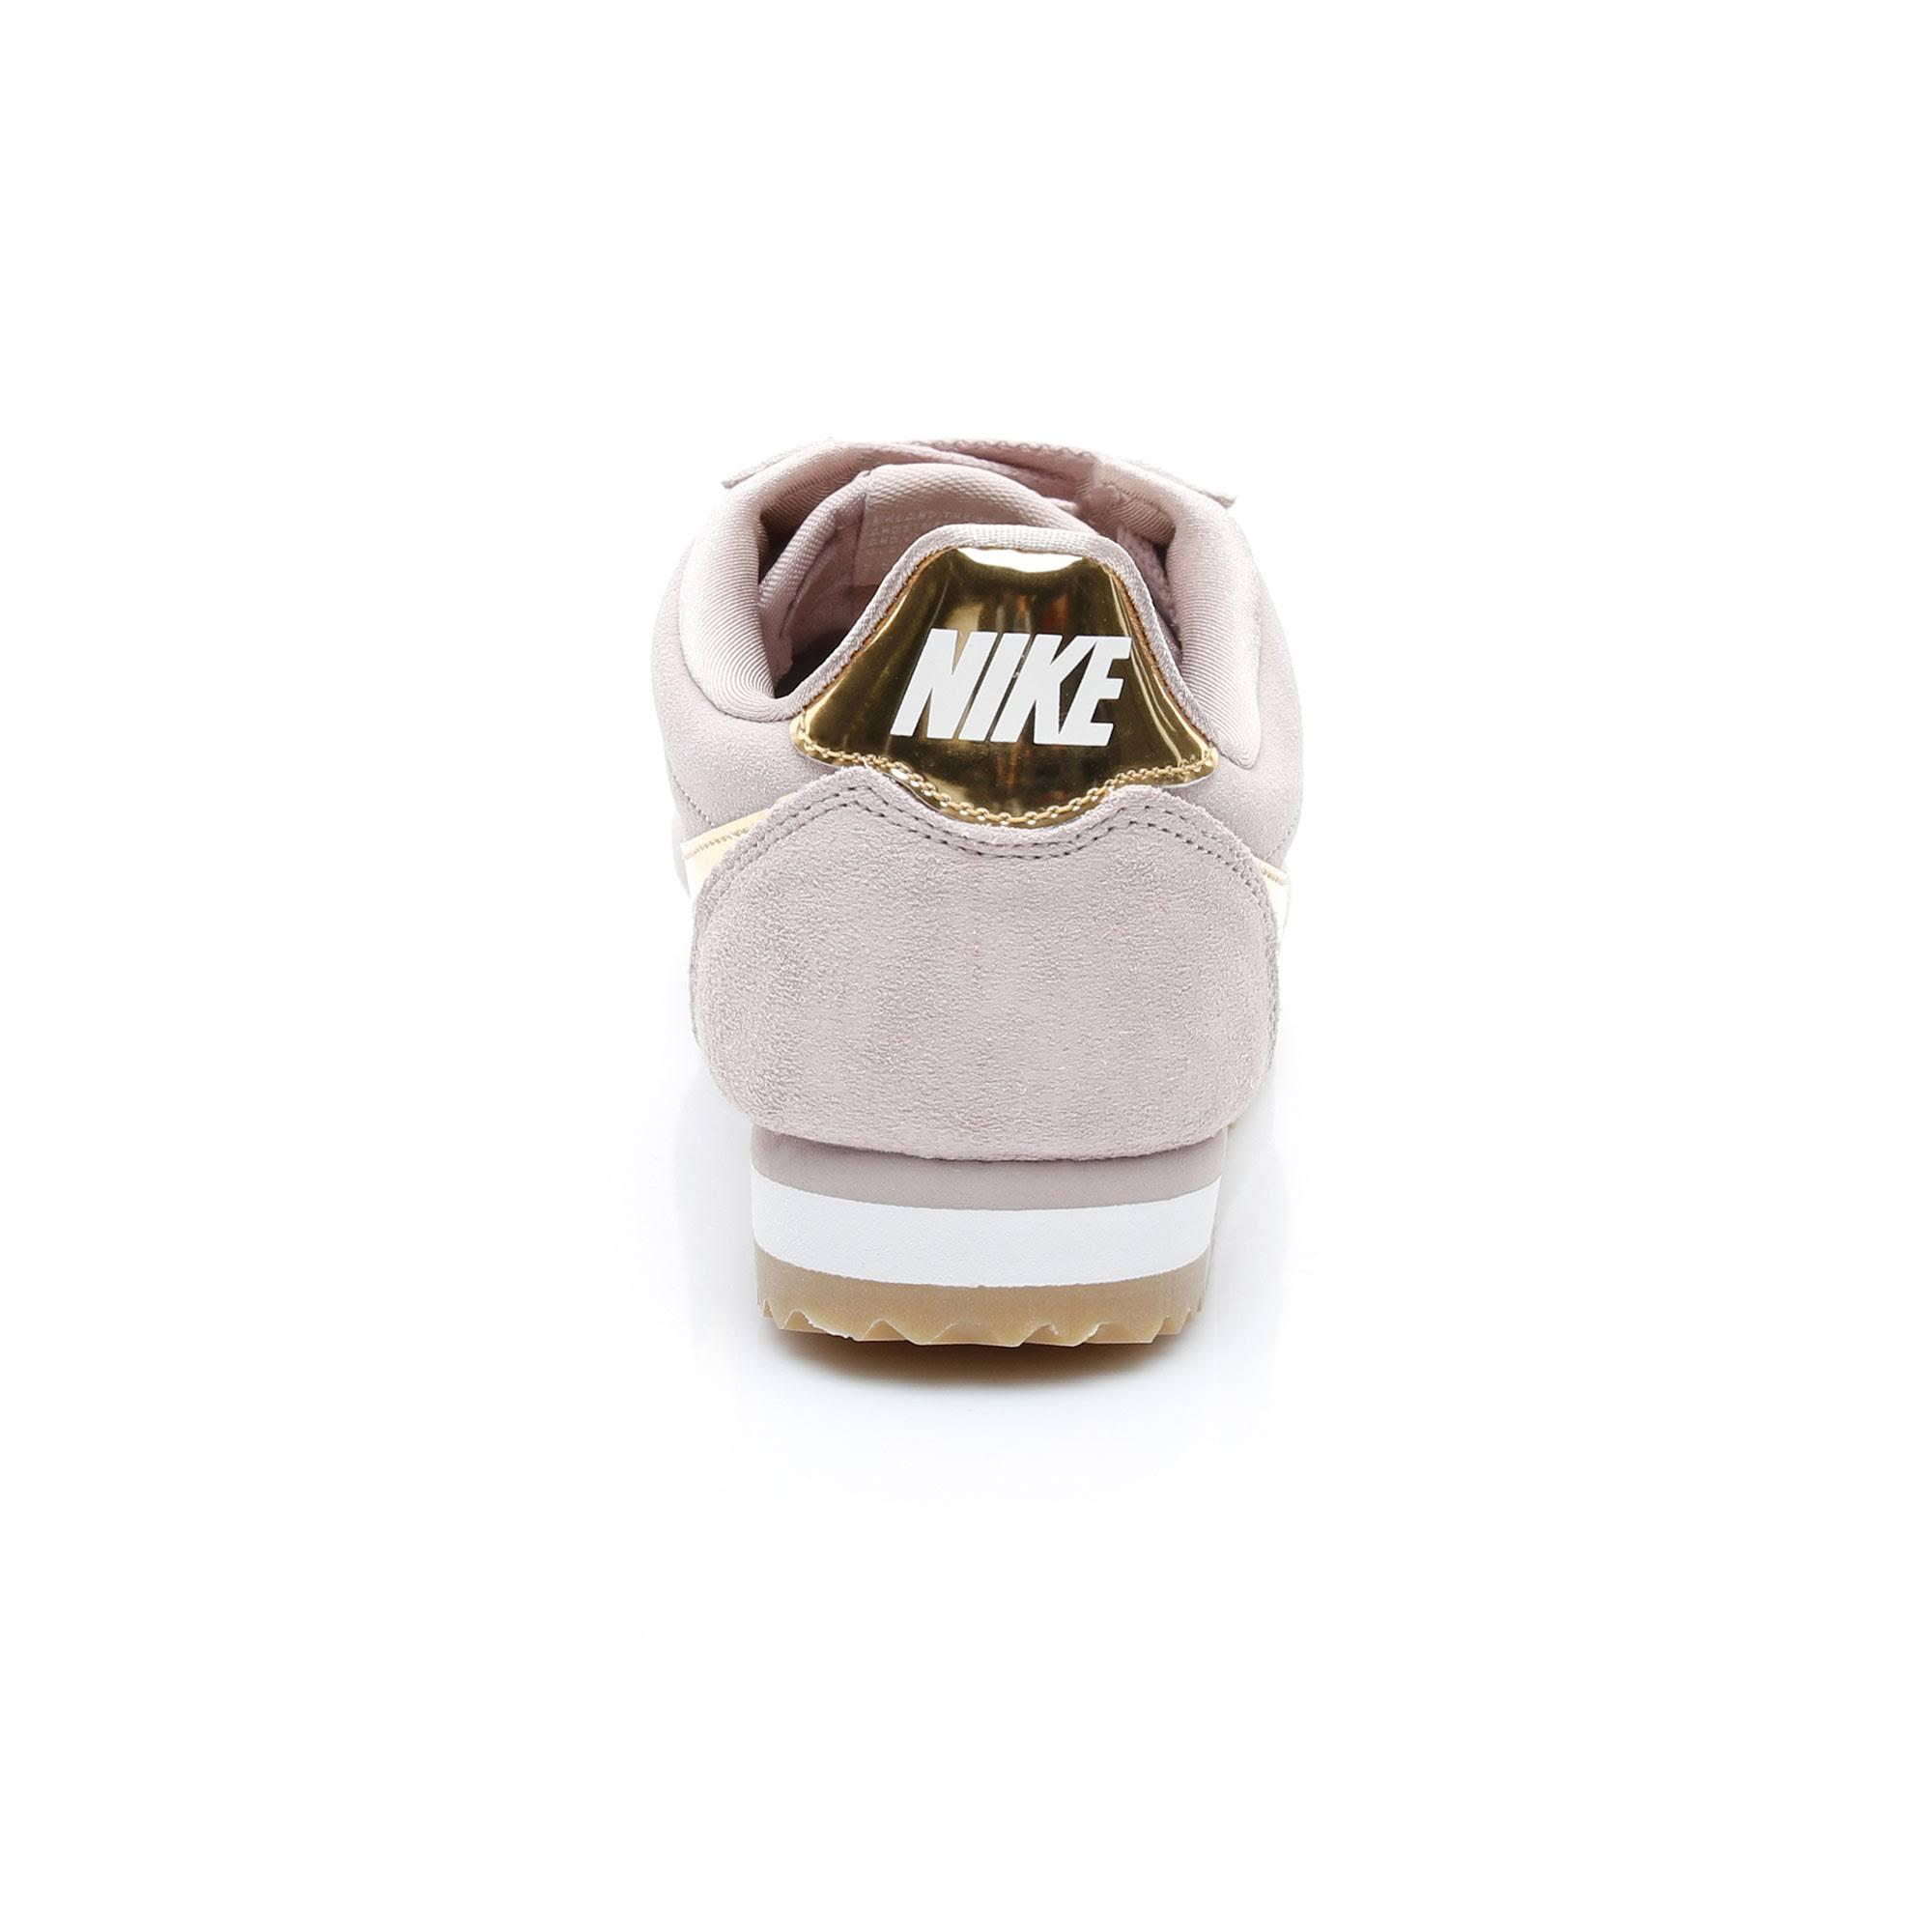 902856 Ayakkabı Nike 204 Spor Kadın Classic Pembe Cortez 1P1Wwa7YqO